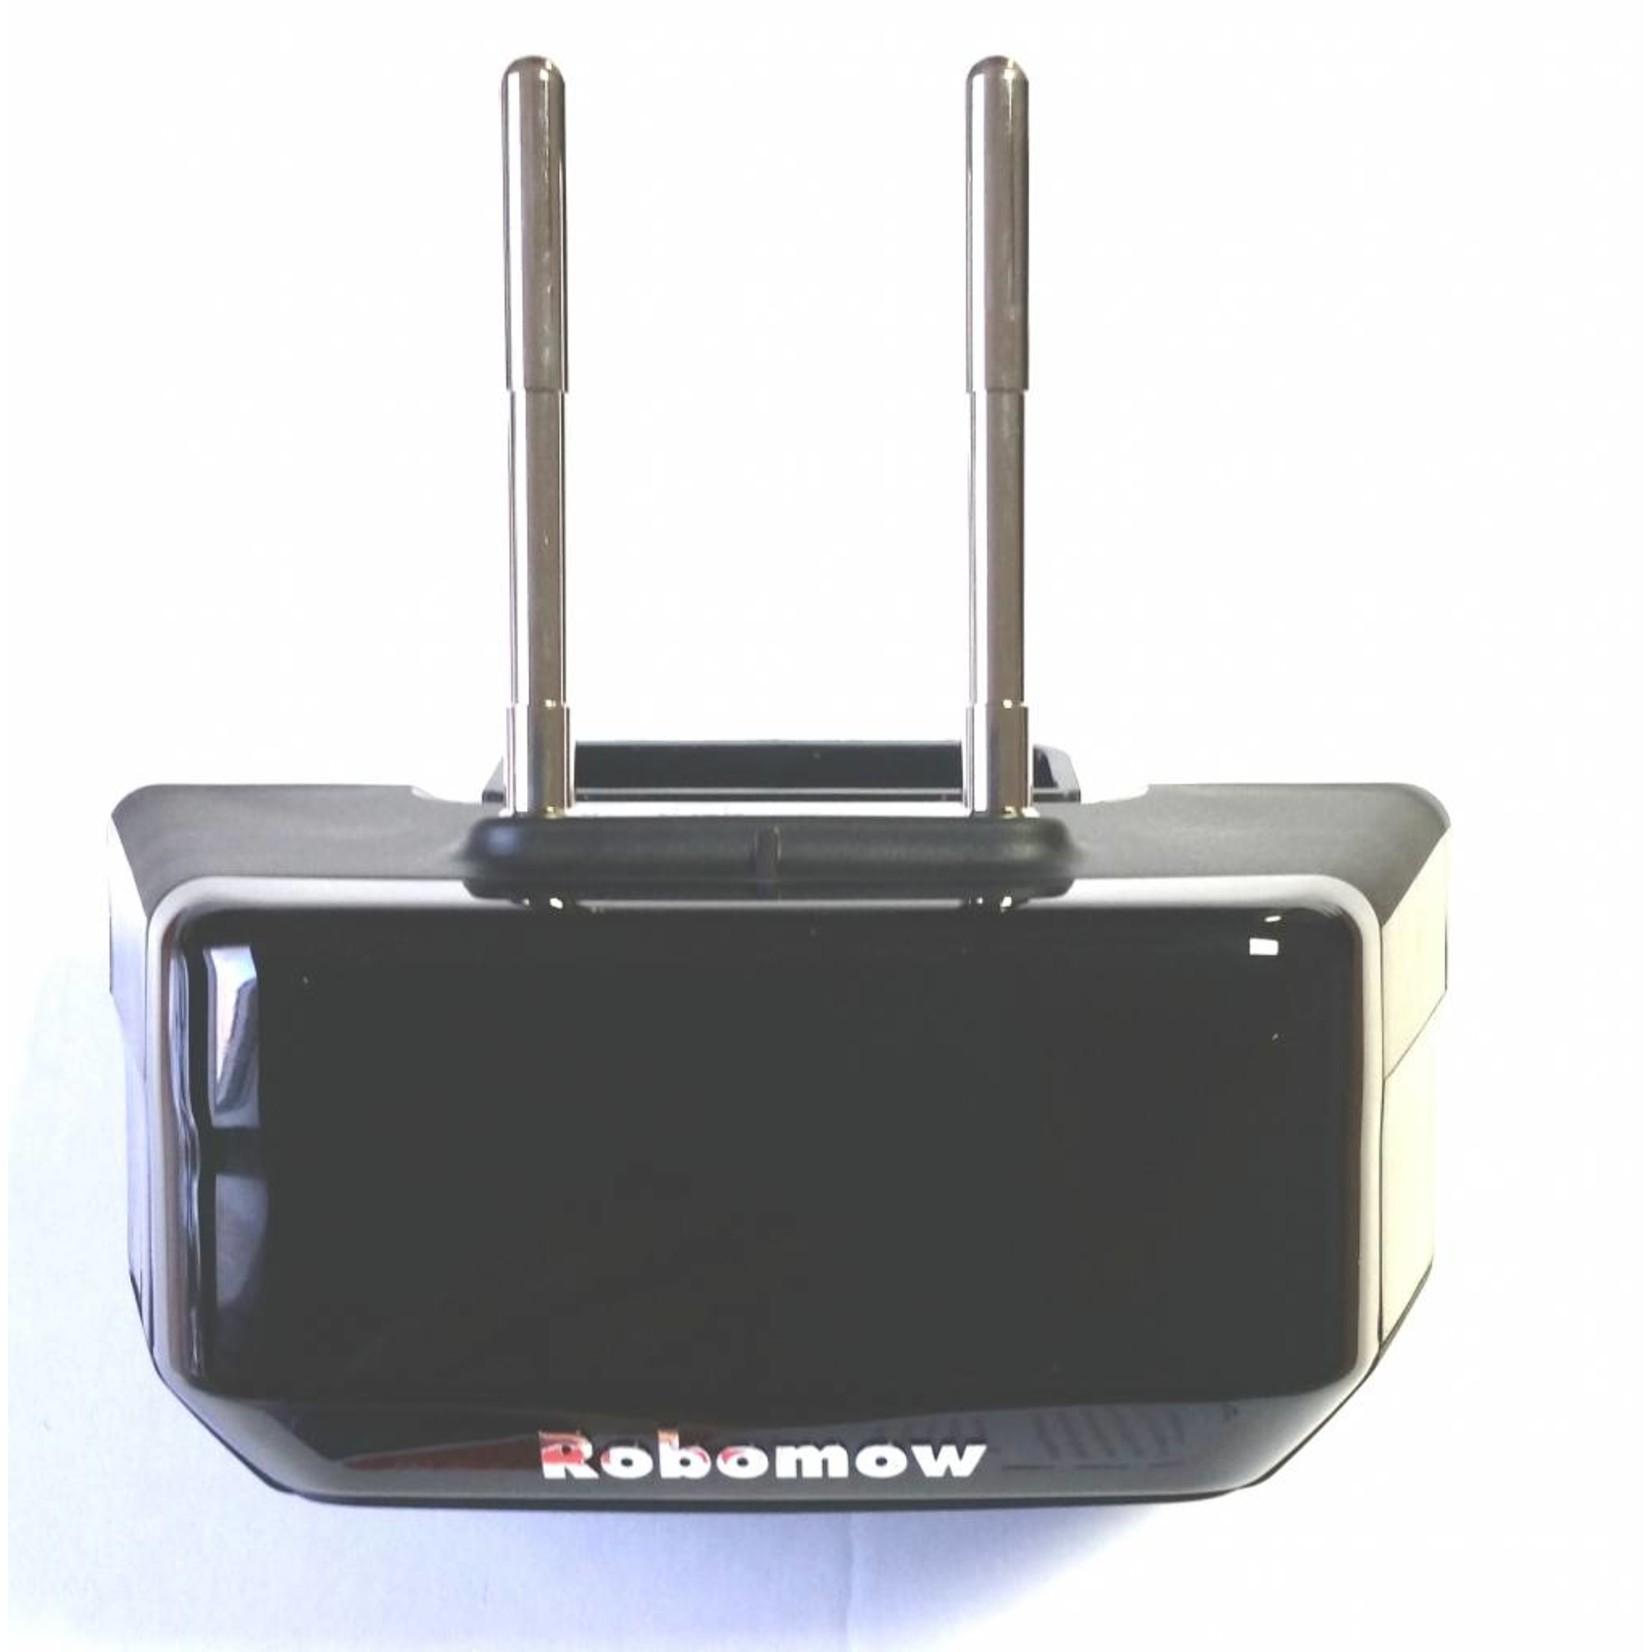 Robomow Robomow Base Station Ladekopf RS/TS/MS-Serie SPP4601A bis 2017 und älter